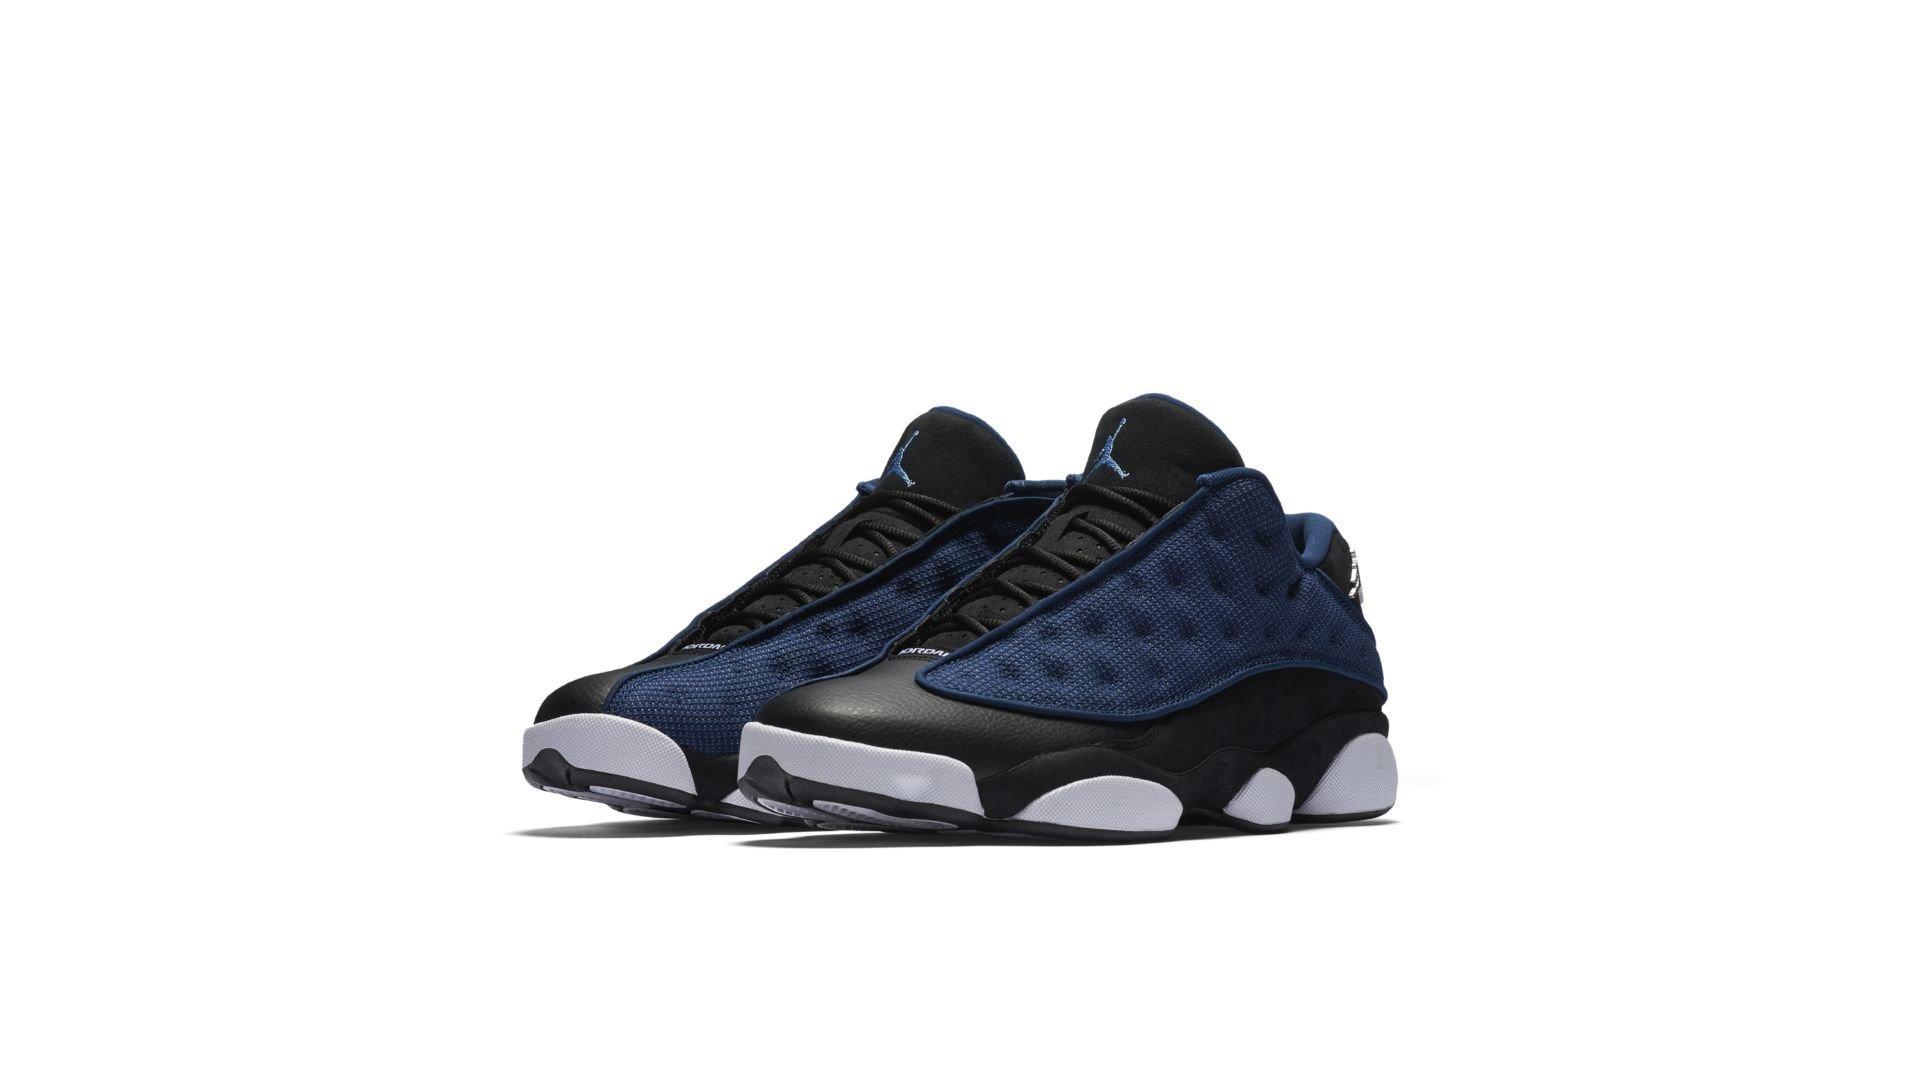 Jordan 13 Retro Low Brave Blue (310810-407)